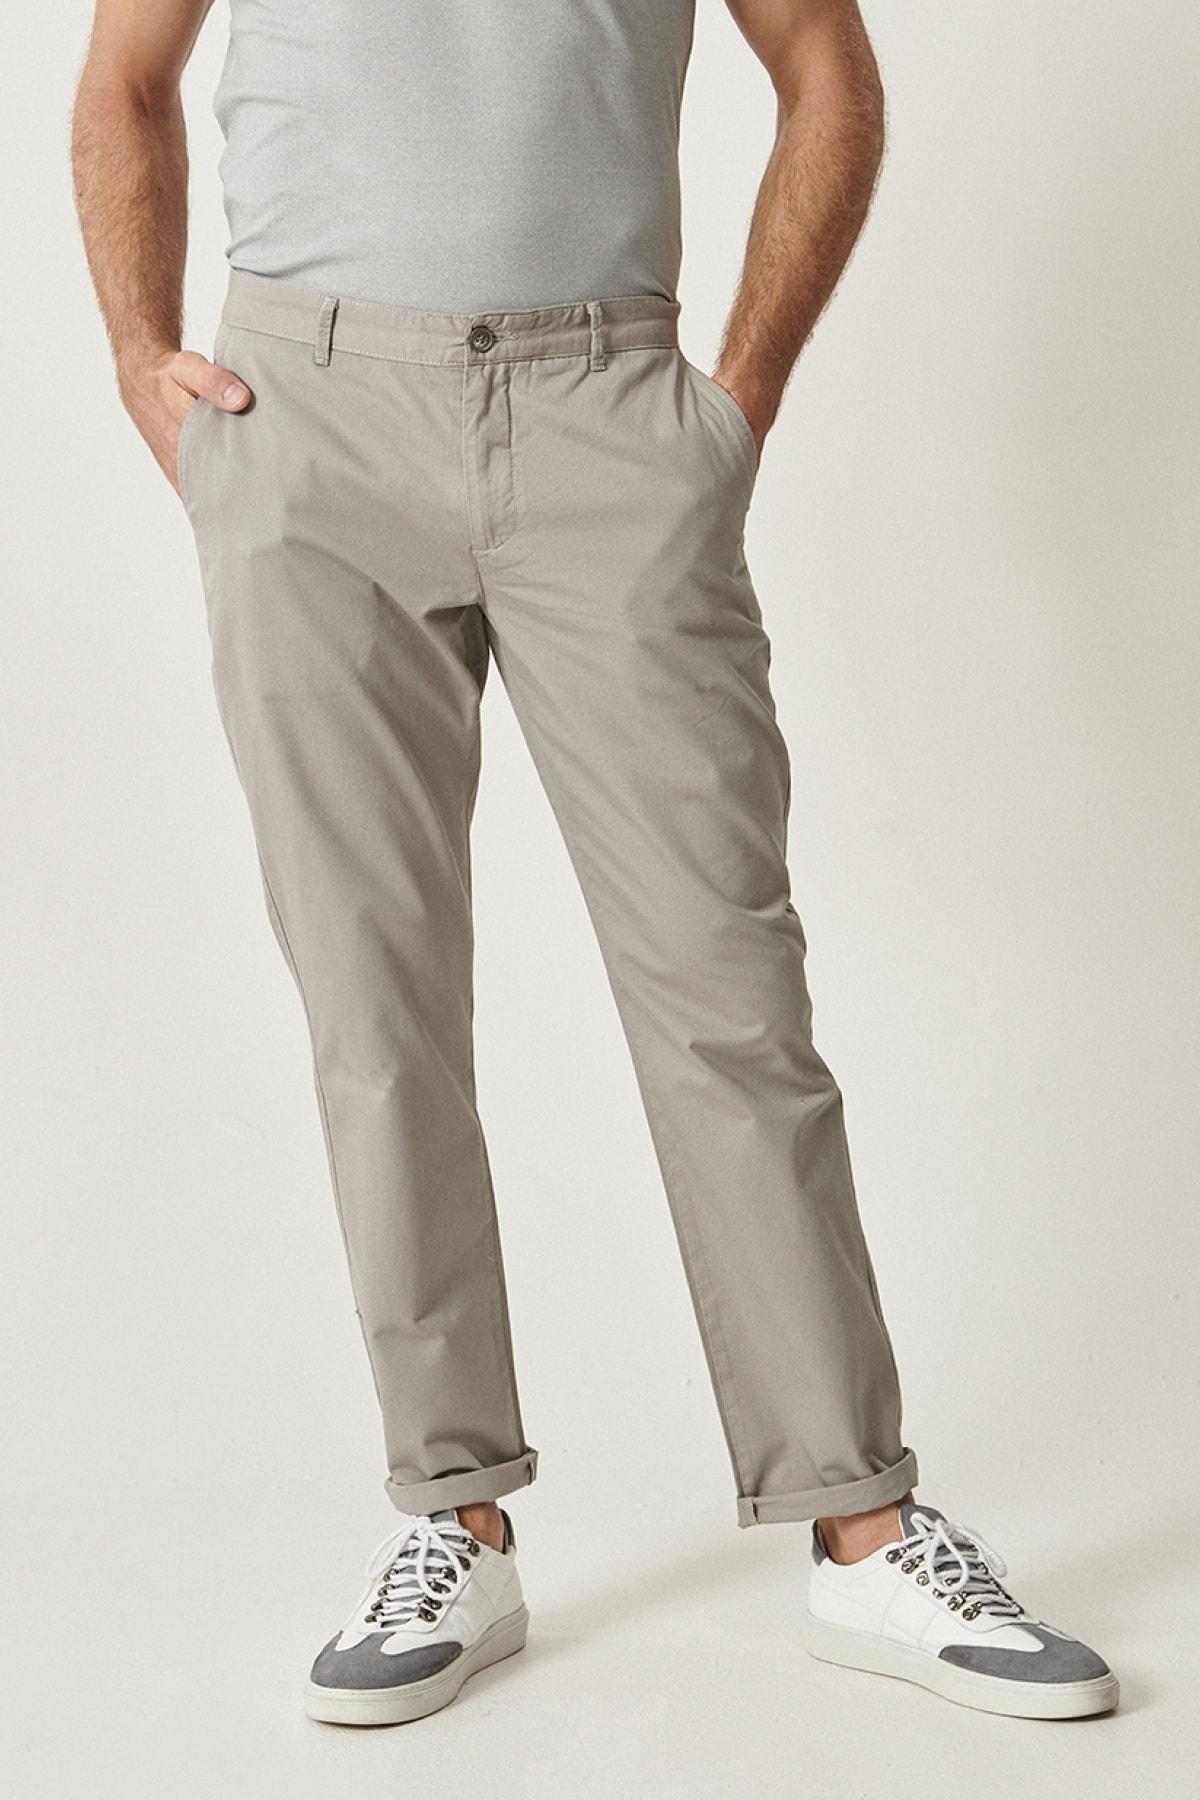 ALTINYILDIZ CLASSICS Erkek Açık Gri Kanvas Slim Fit Chino Pantolon 1